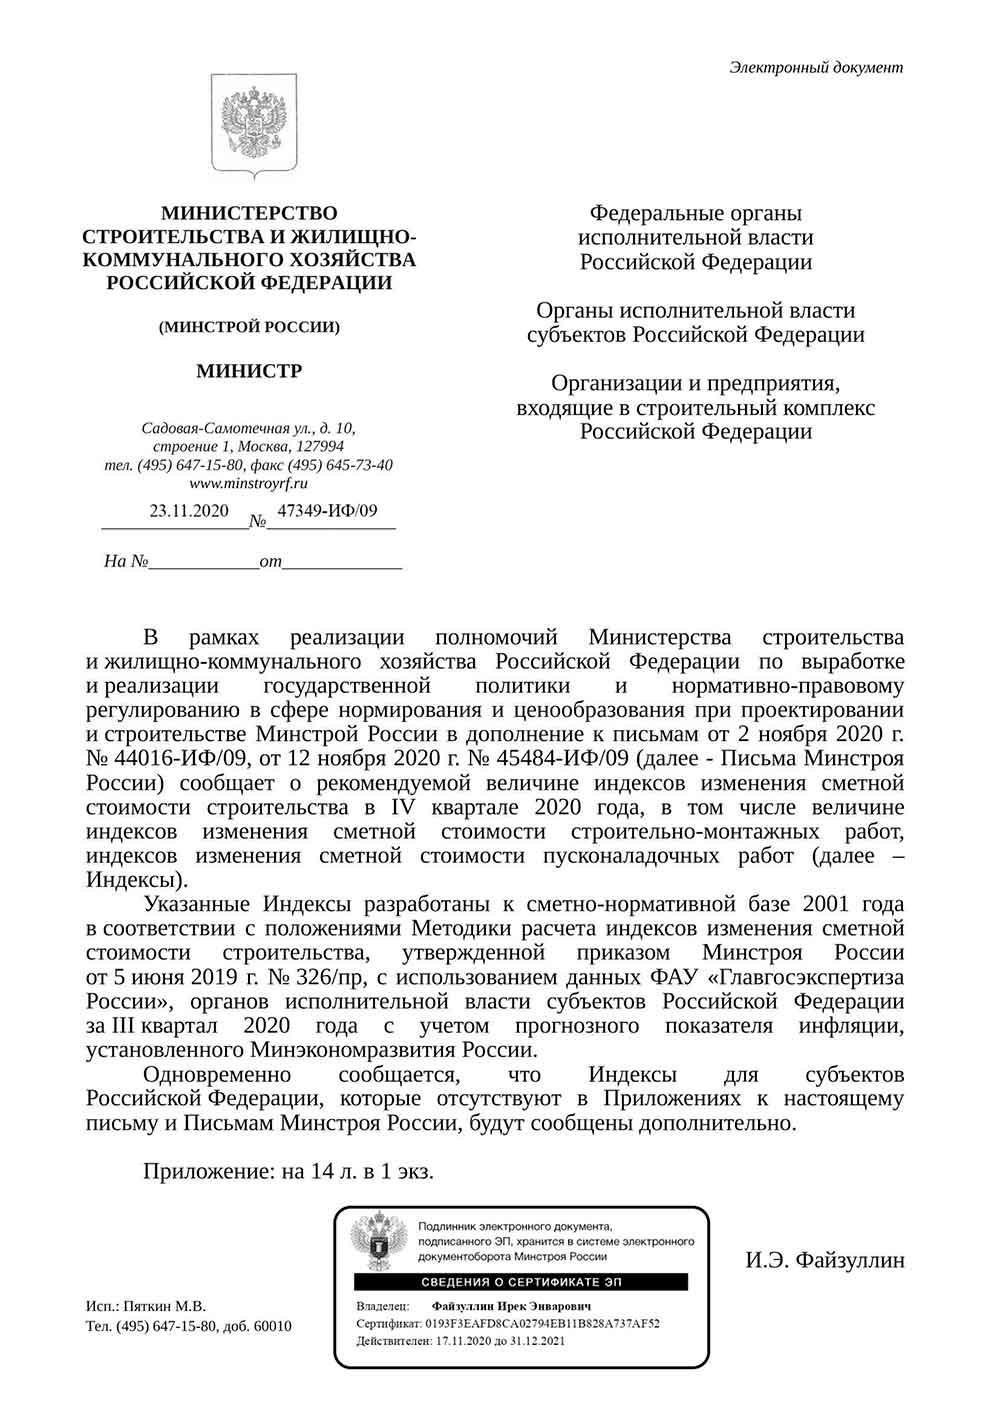 Письмо Минстроя РФ №47349-ИФ/09 от 23.11.2020 г.